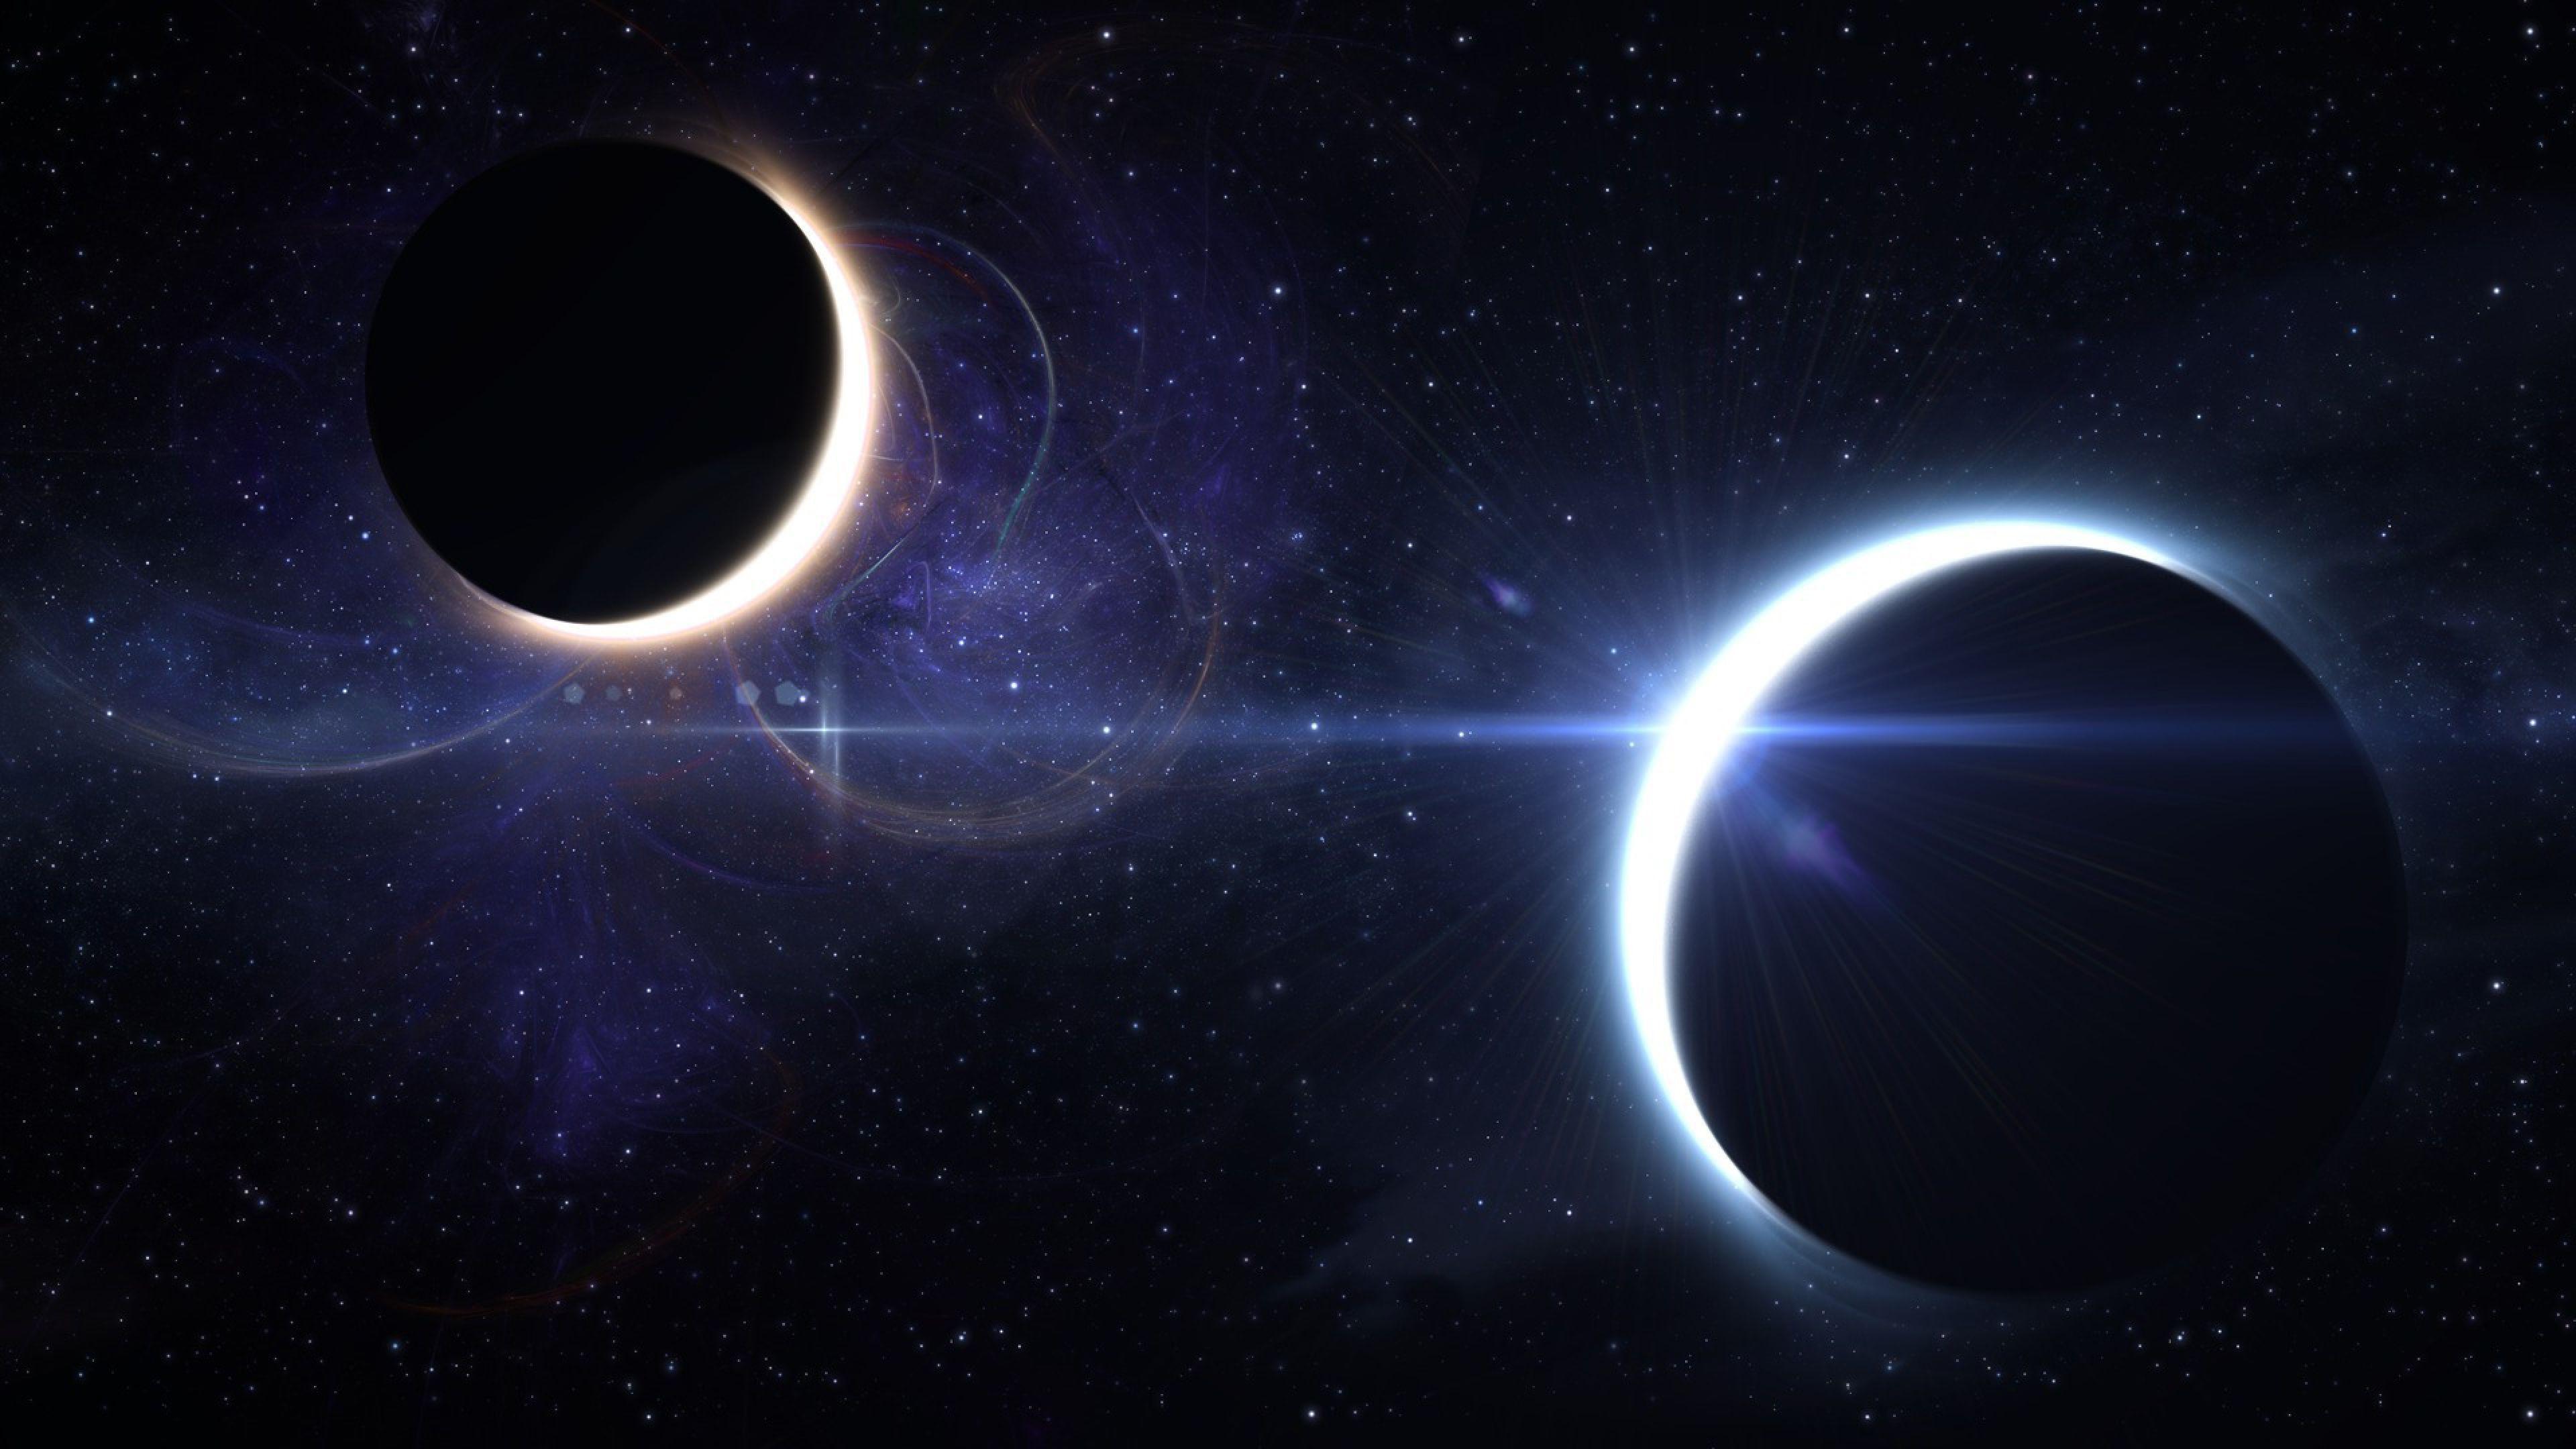 Solar Eclipse 4K Wallpapers - Top Free Solar Eclipse 4K ...